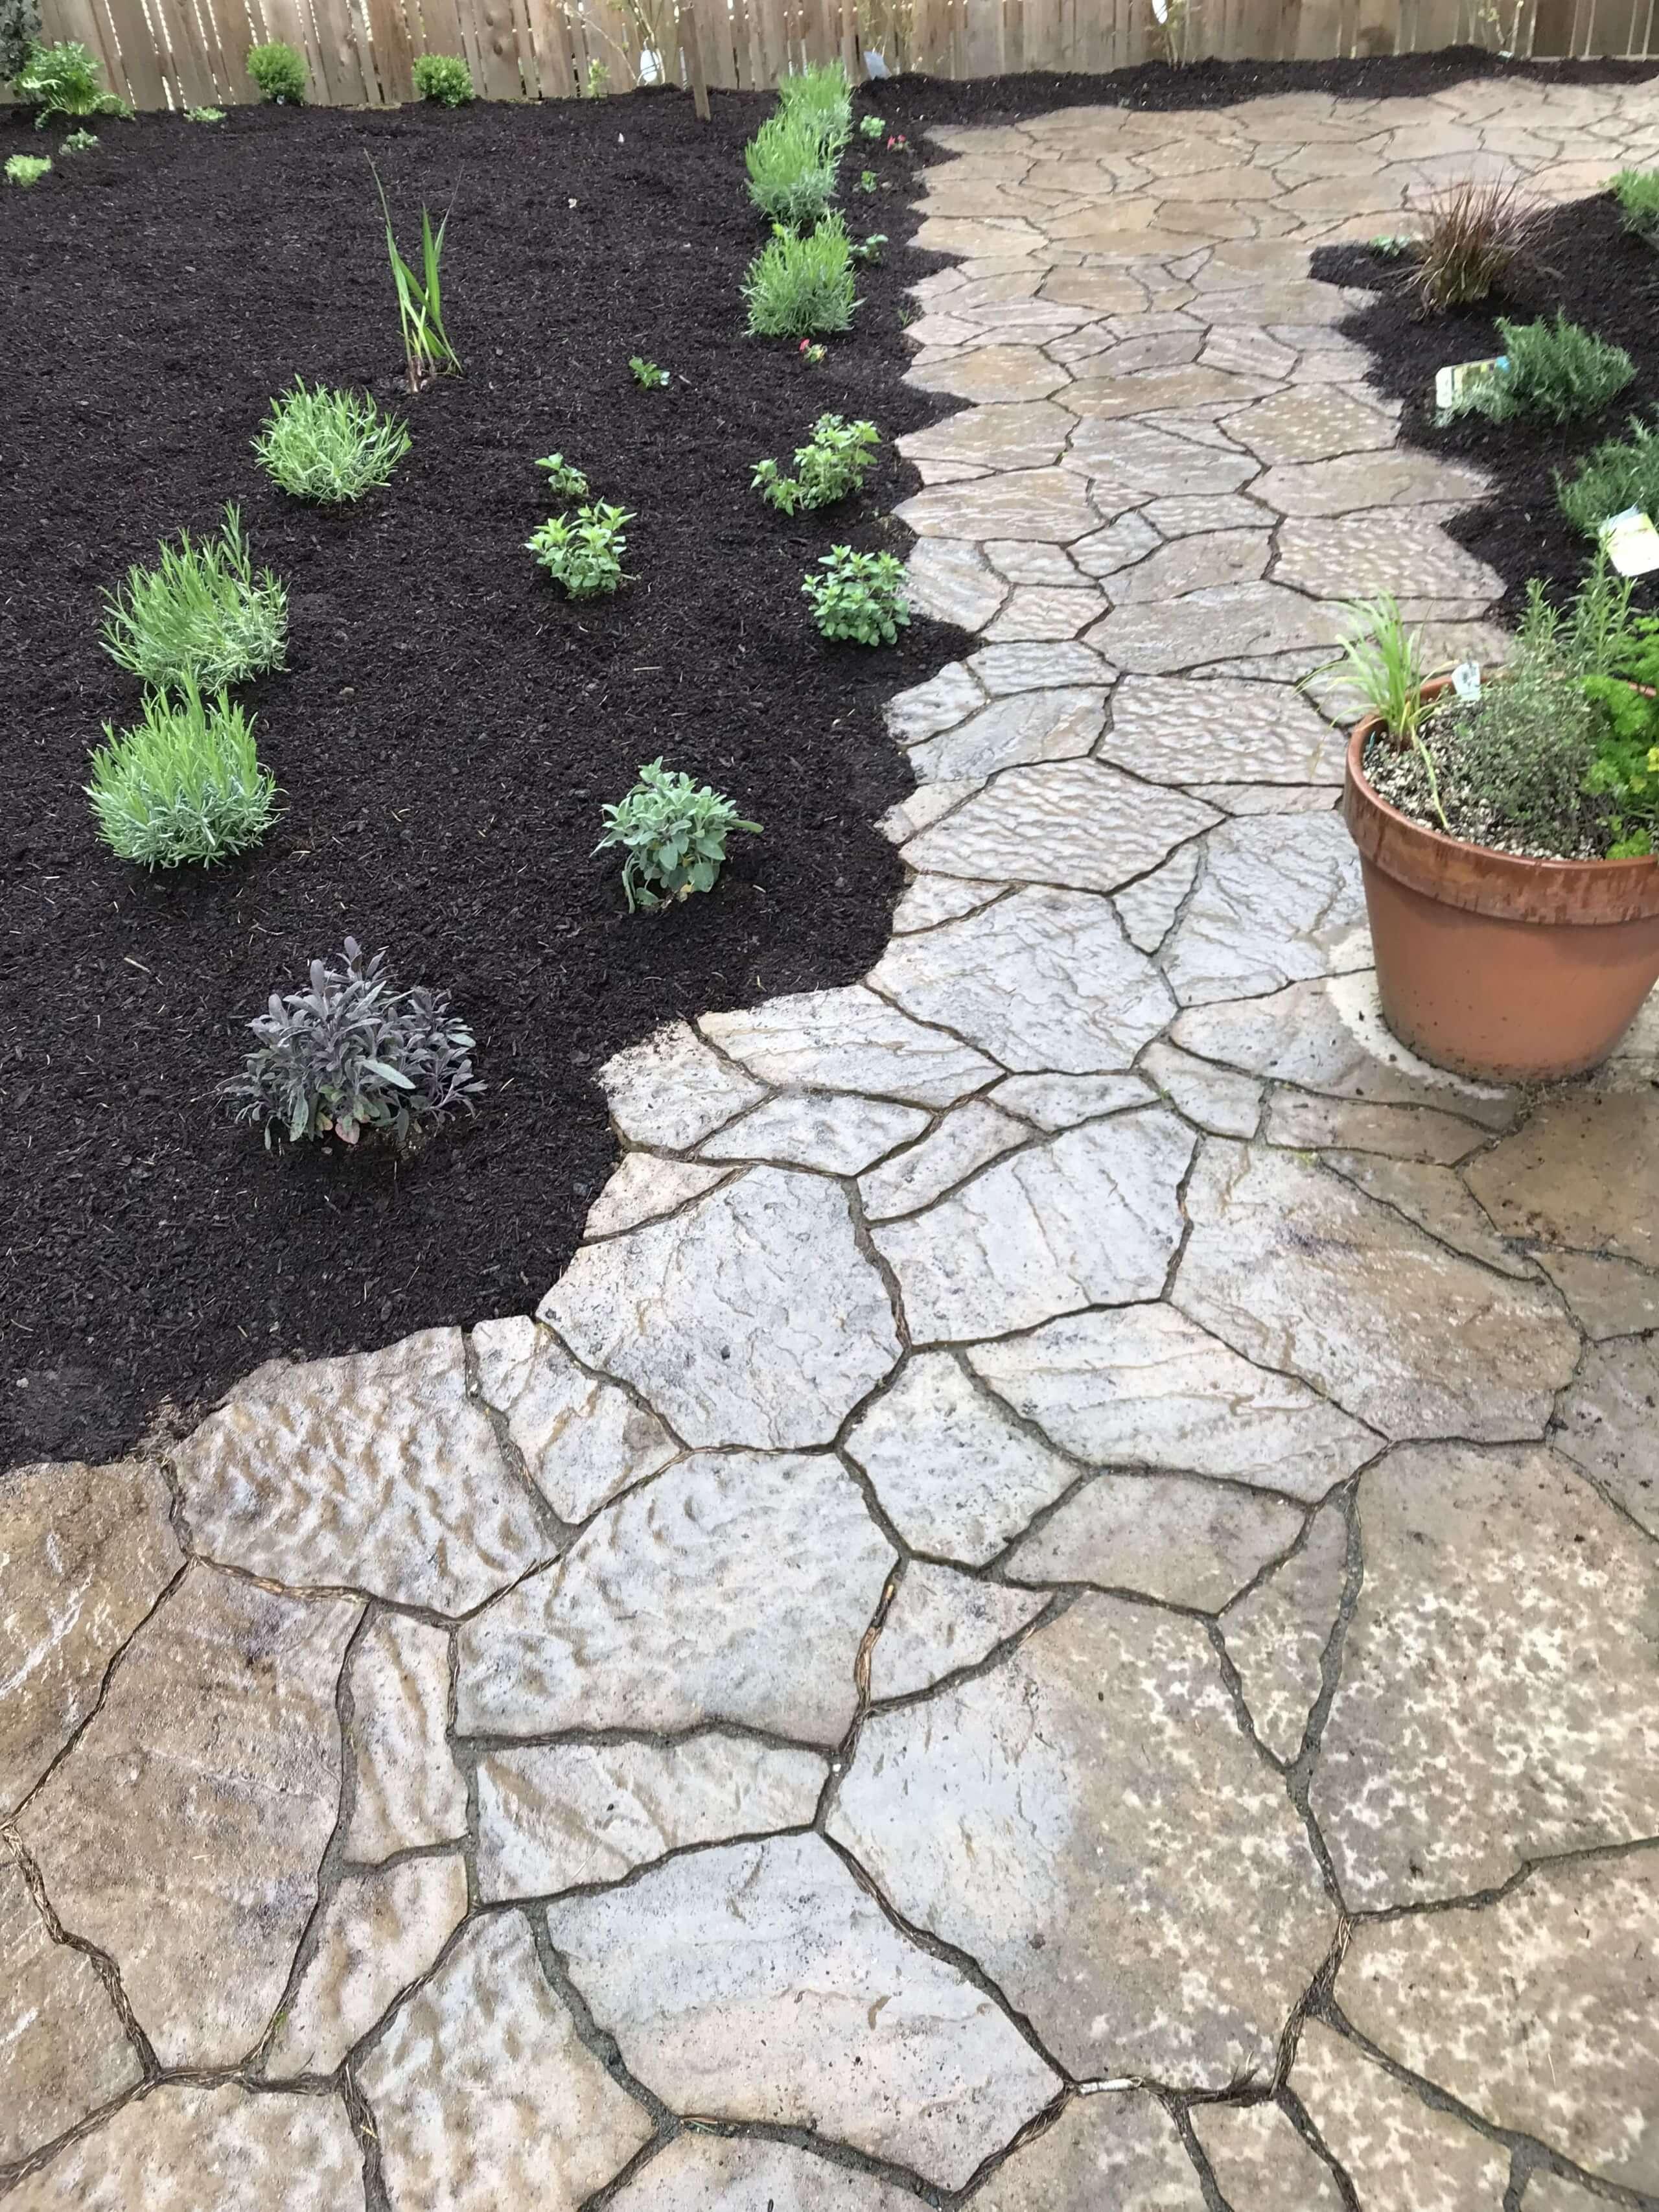 https://shovelandthumb.sfo3.digitaloceanspaces.com/patios walkways/walkway 5